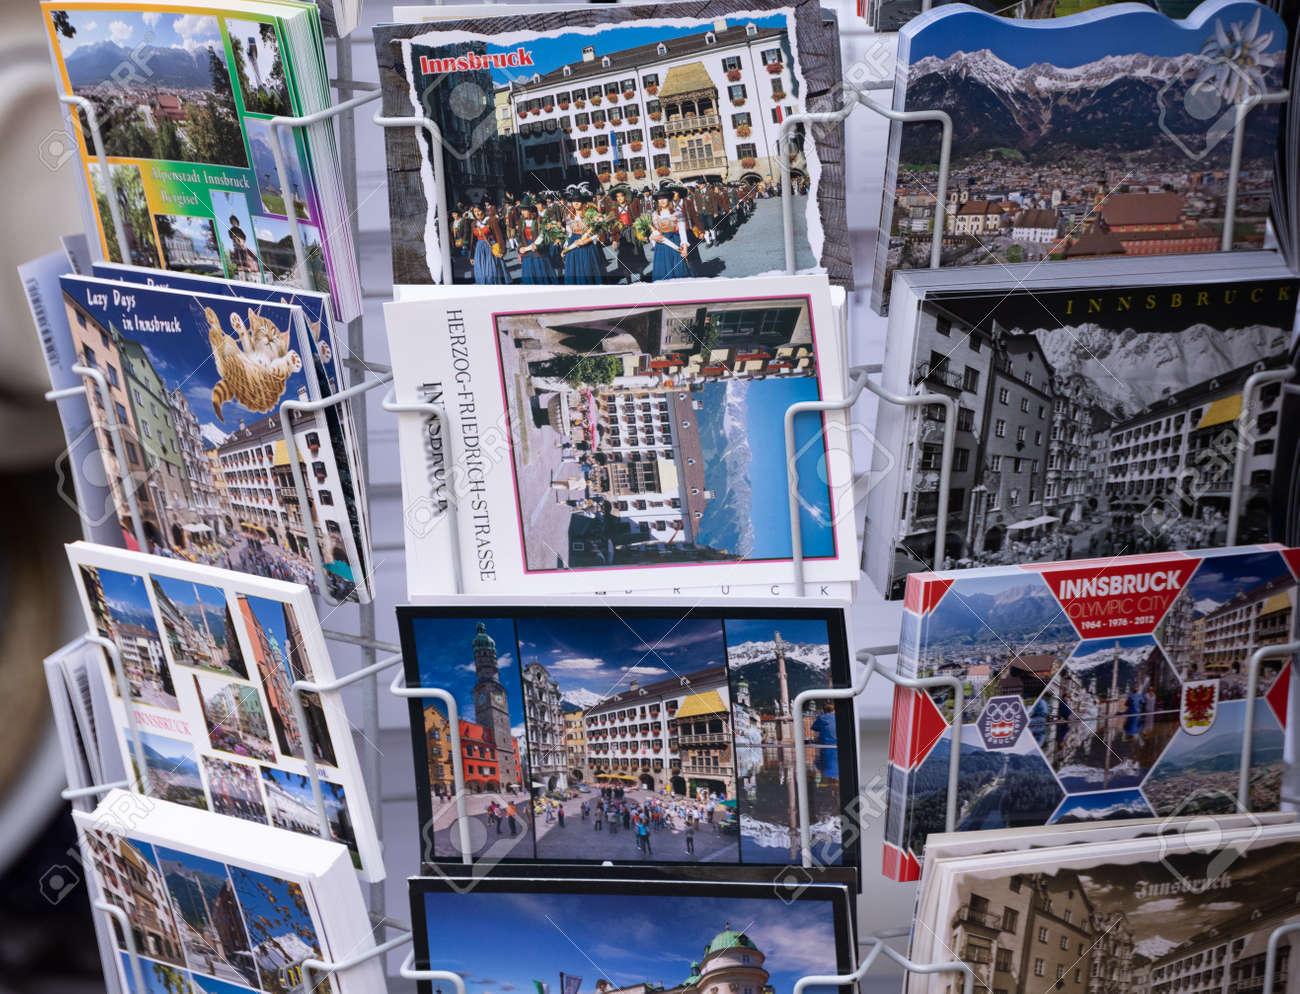 Postcards from Innsbruck AUSTRIA, EUROPE - souvenir shop - INNSBRUCK, AUSTRIA, EUROPE - JULY 29, 2021 - 173492632